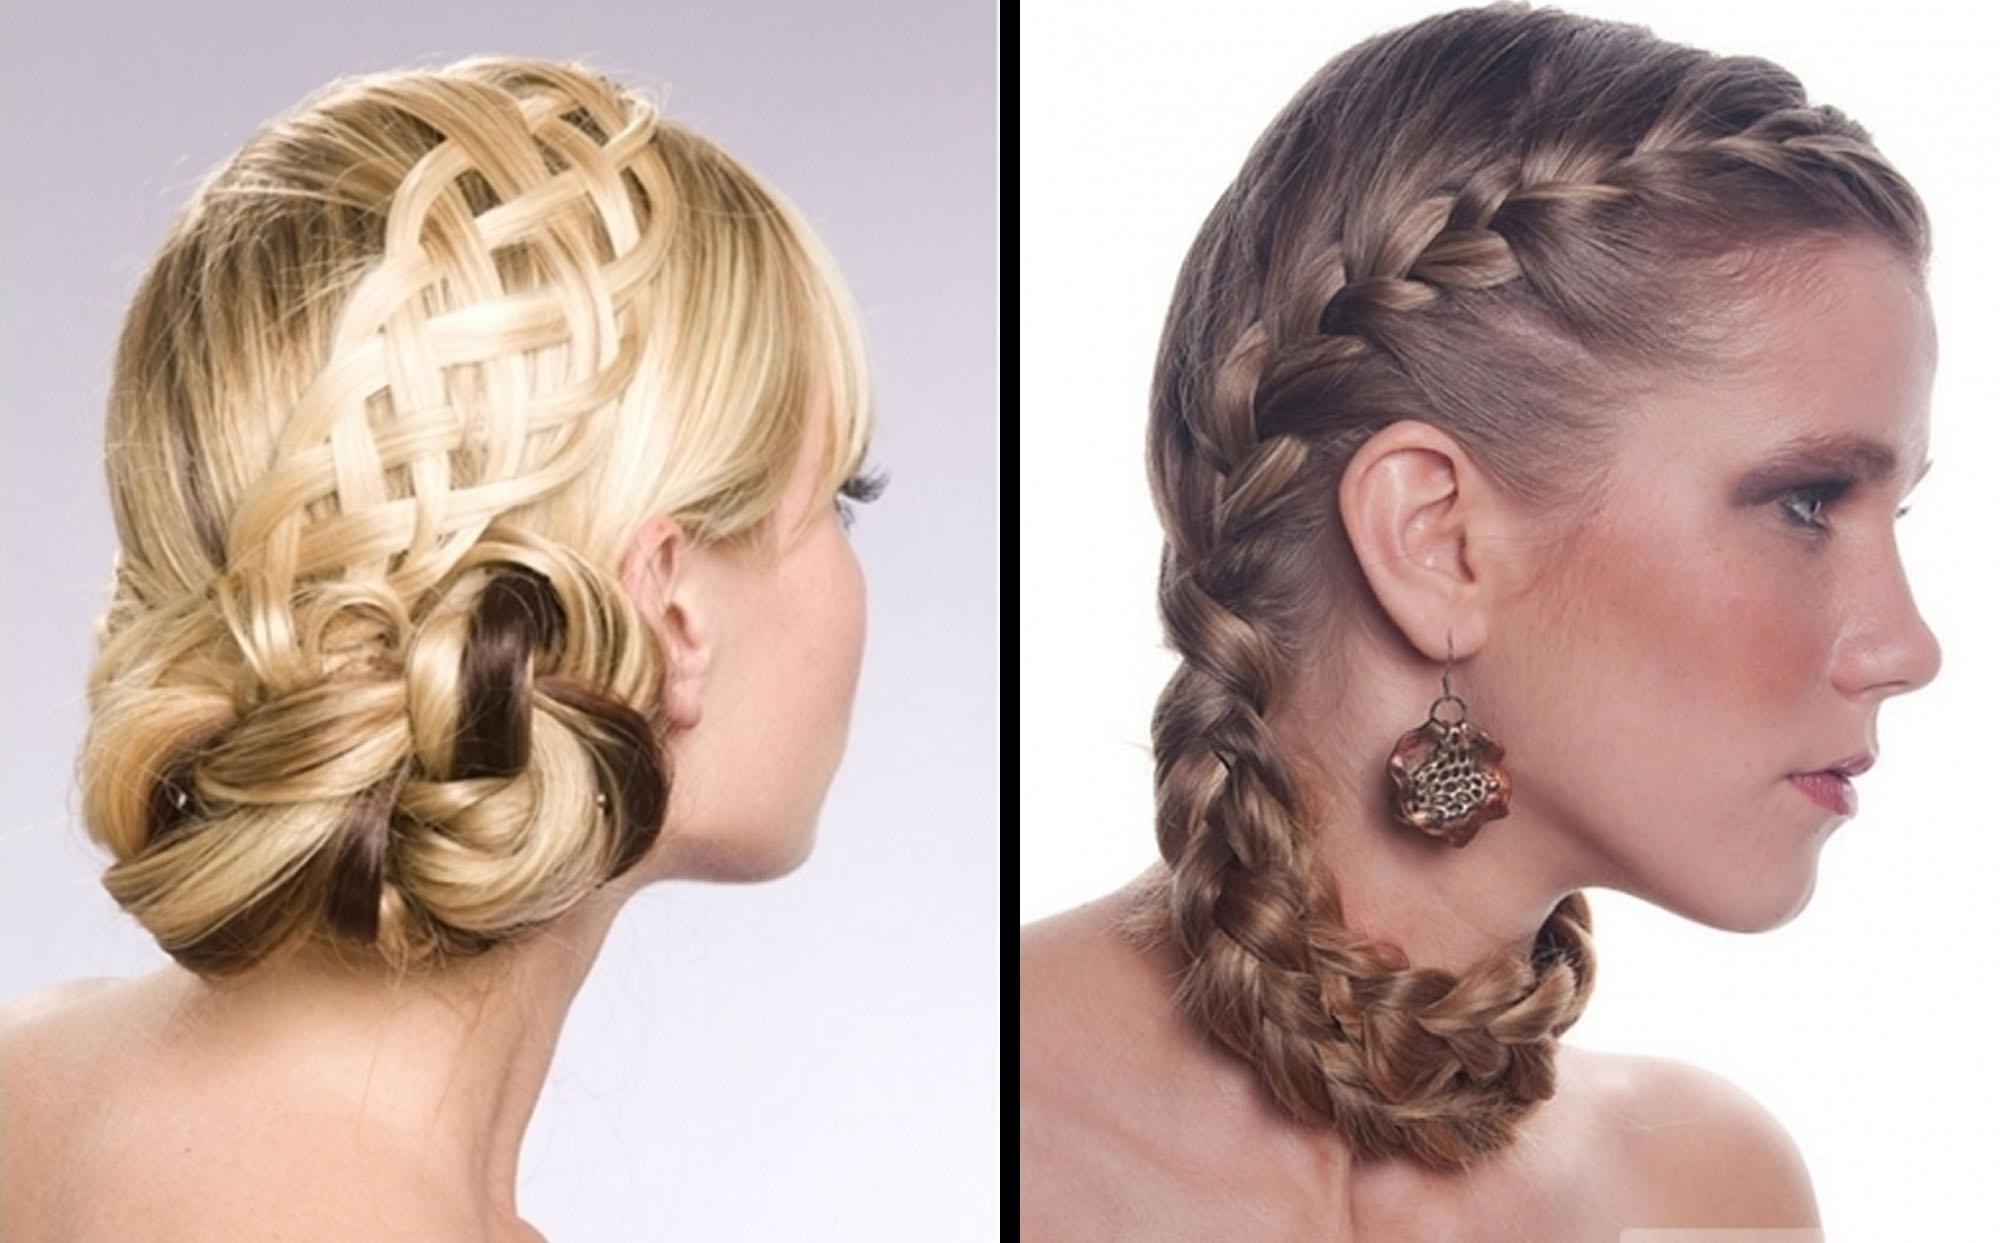 Fancy Updo Hairstyles Fancy Updo Hairstyles For Long Hair Elegant Within Fancy Updo Hairstyles (View 9 of 15)